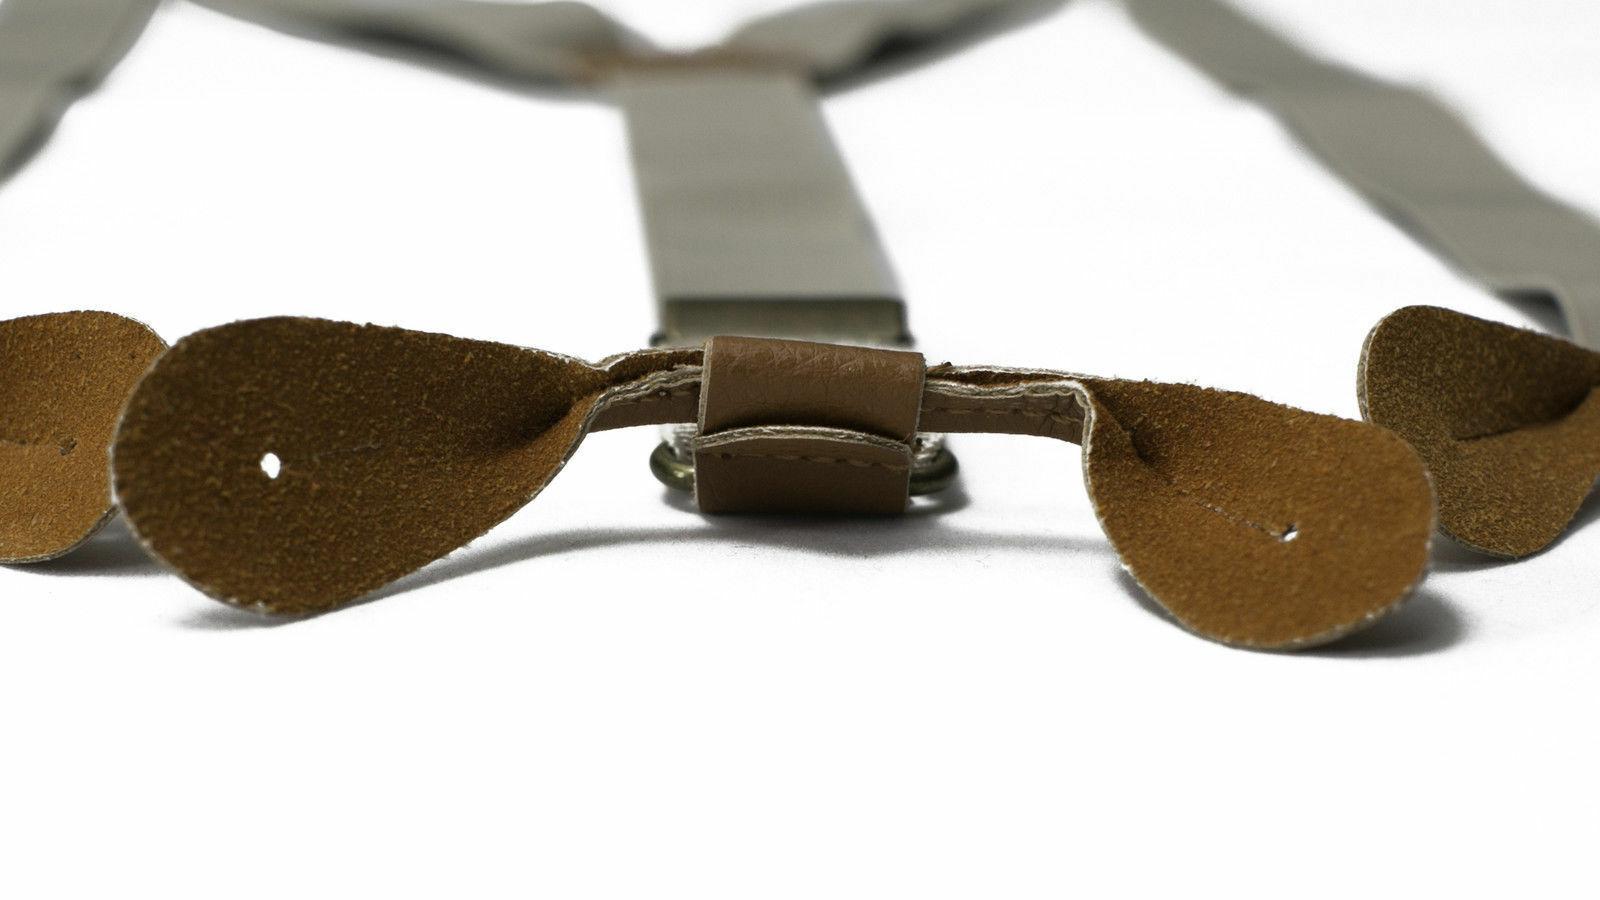 Beige Unisex Suspender Braces Adjustable Leather Button Holes Lycra/Elastane UK image 7